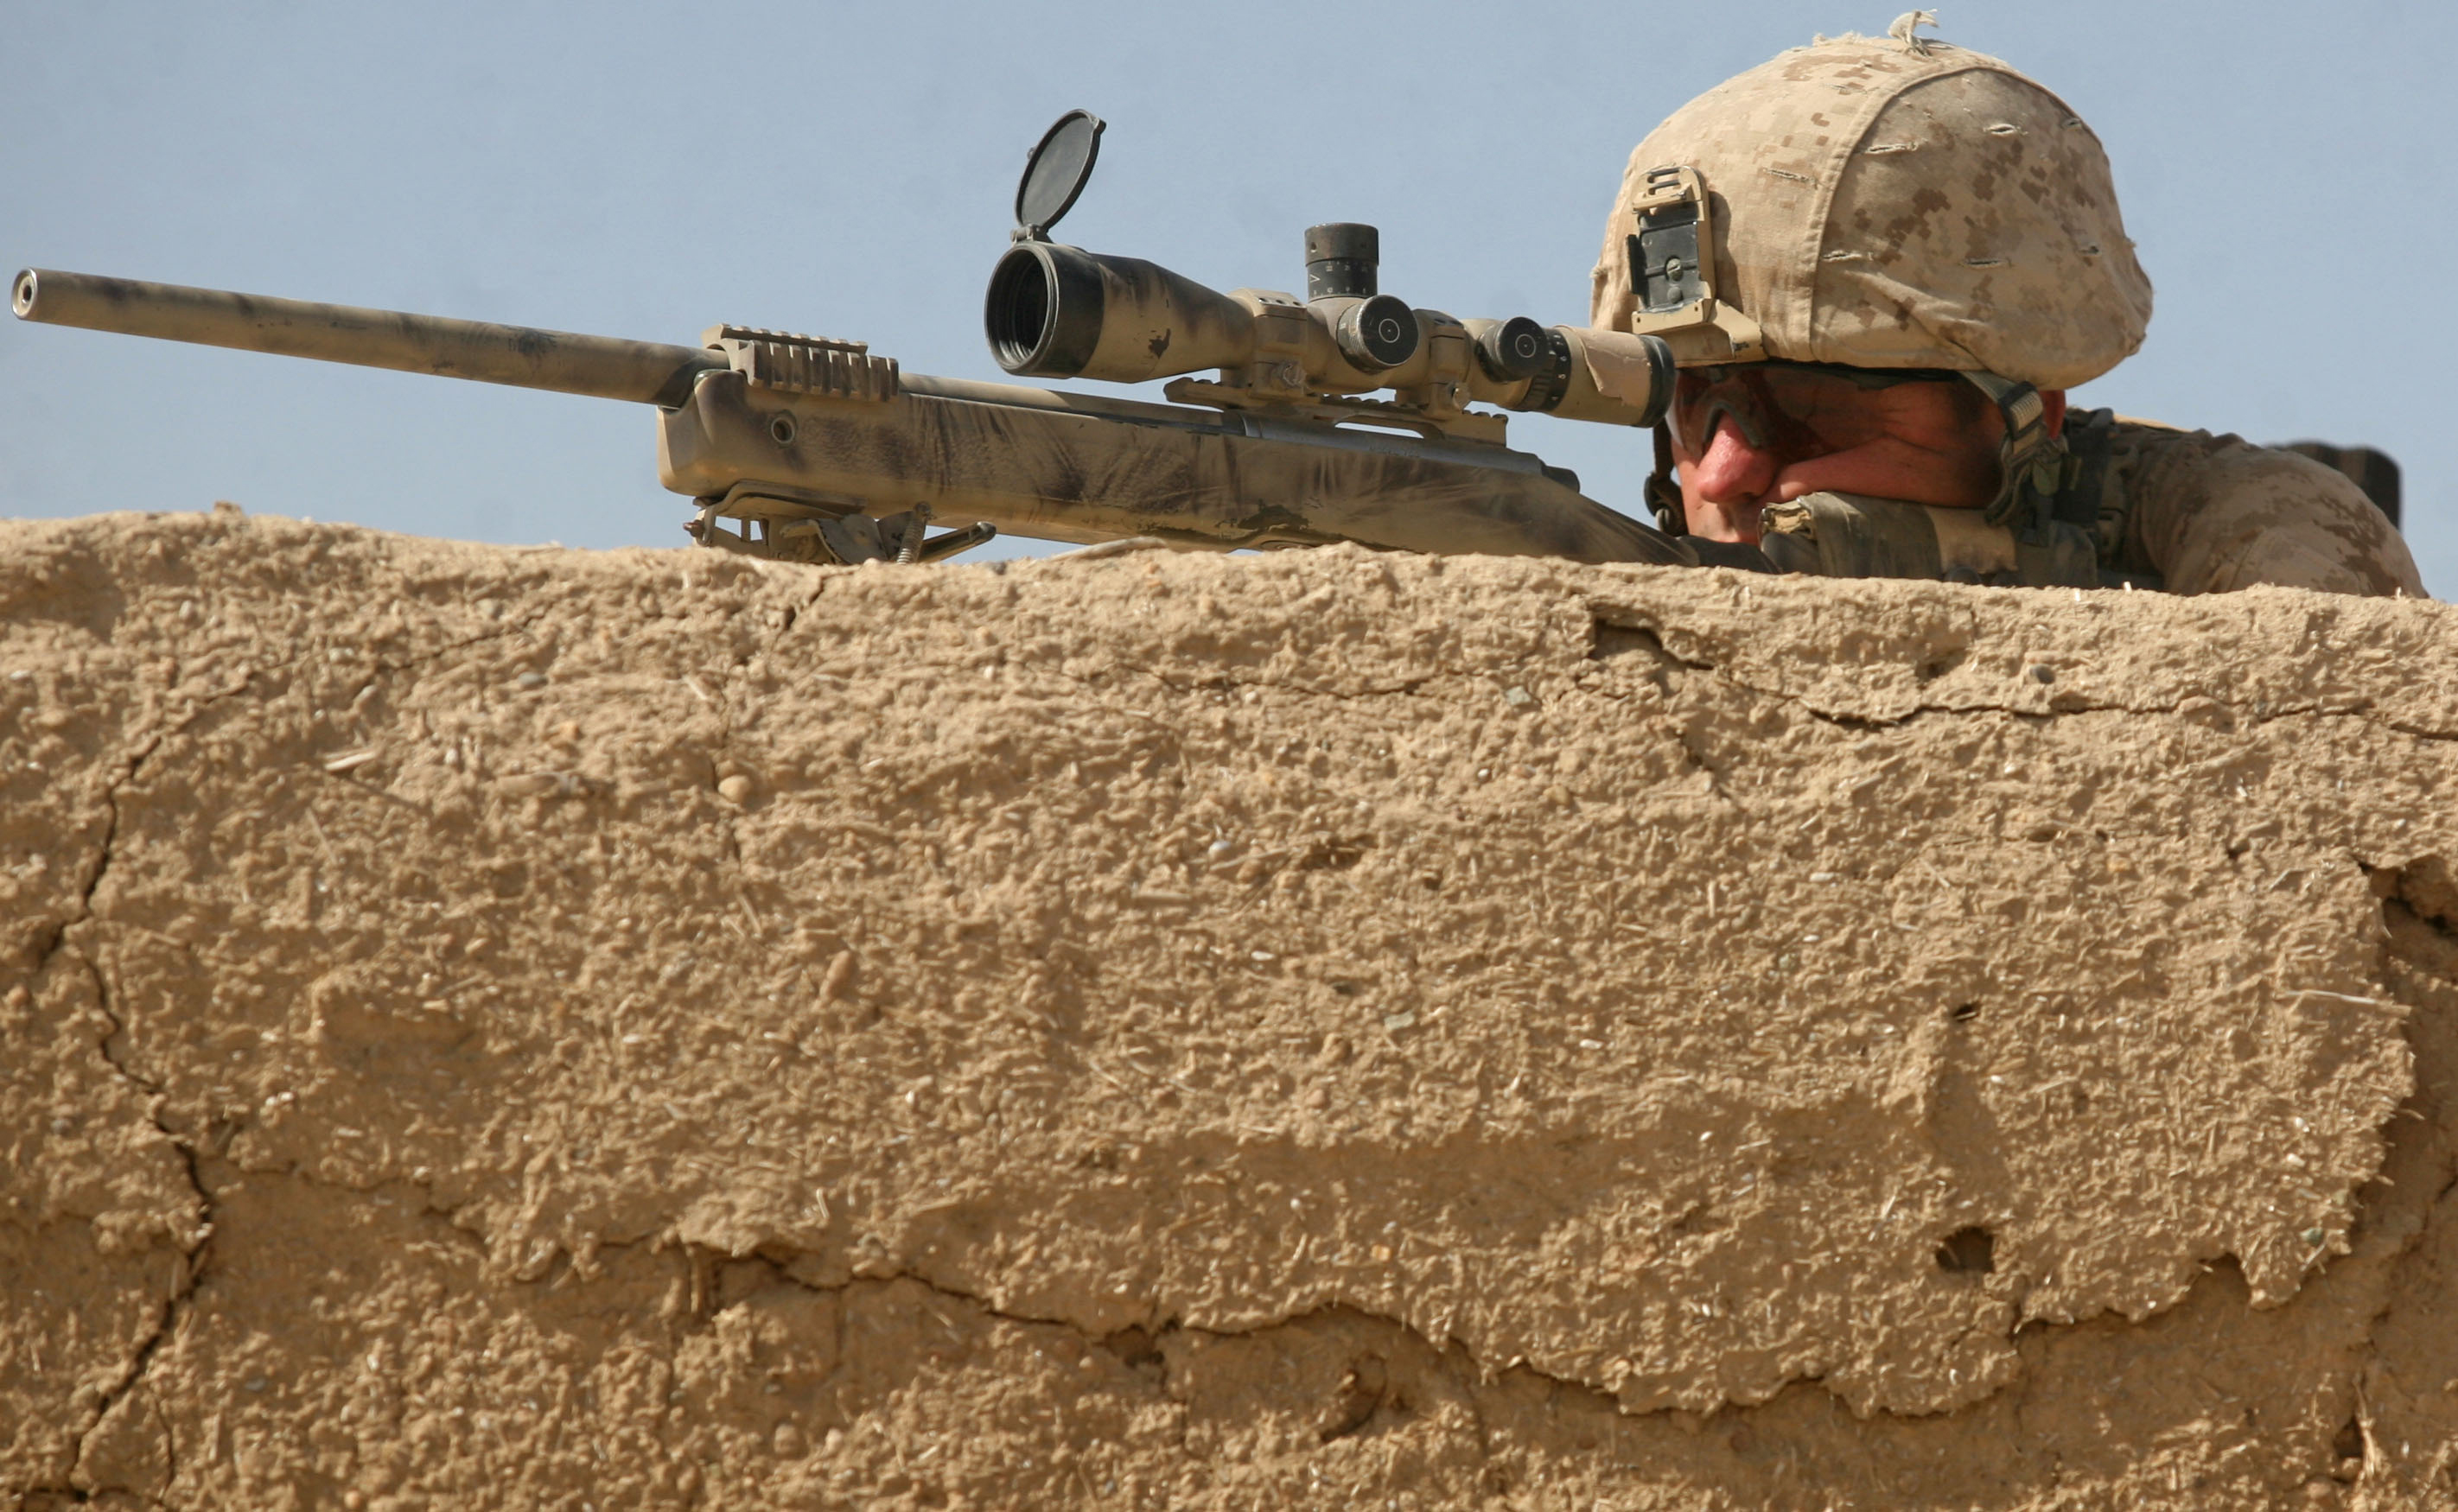 File:Defense.gov News Photo 100216-M-5645B-007.jpg - Wikimedia Commons